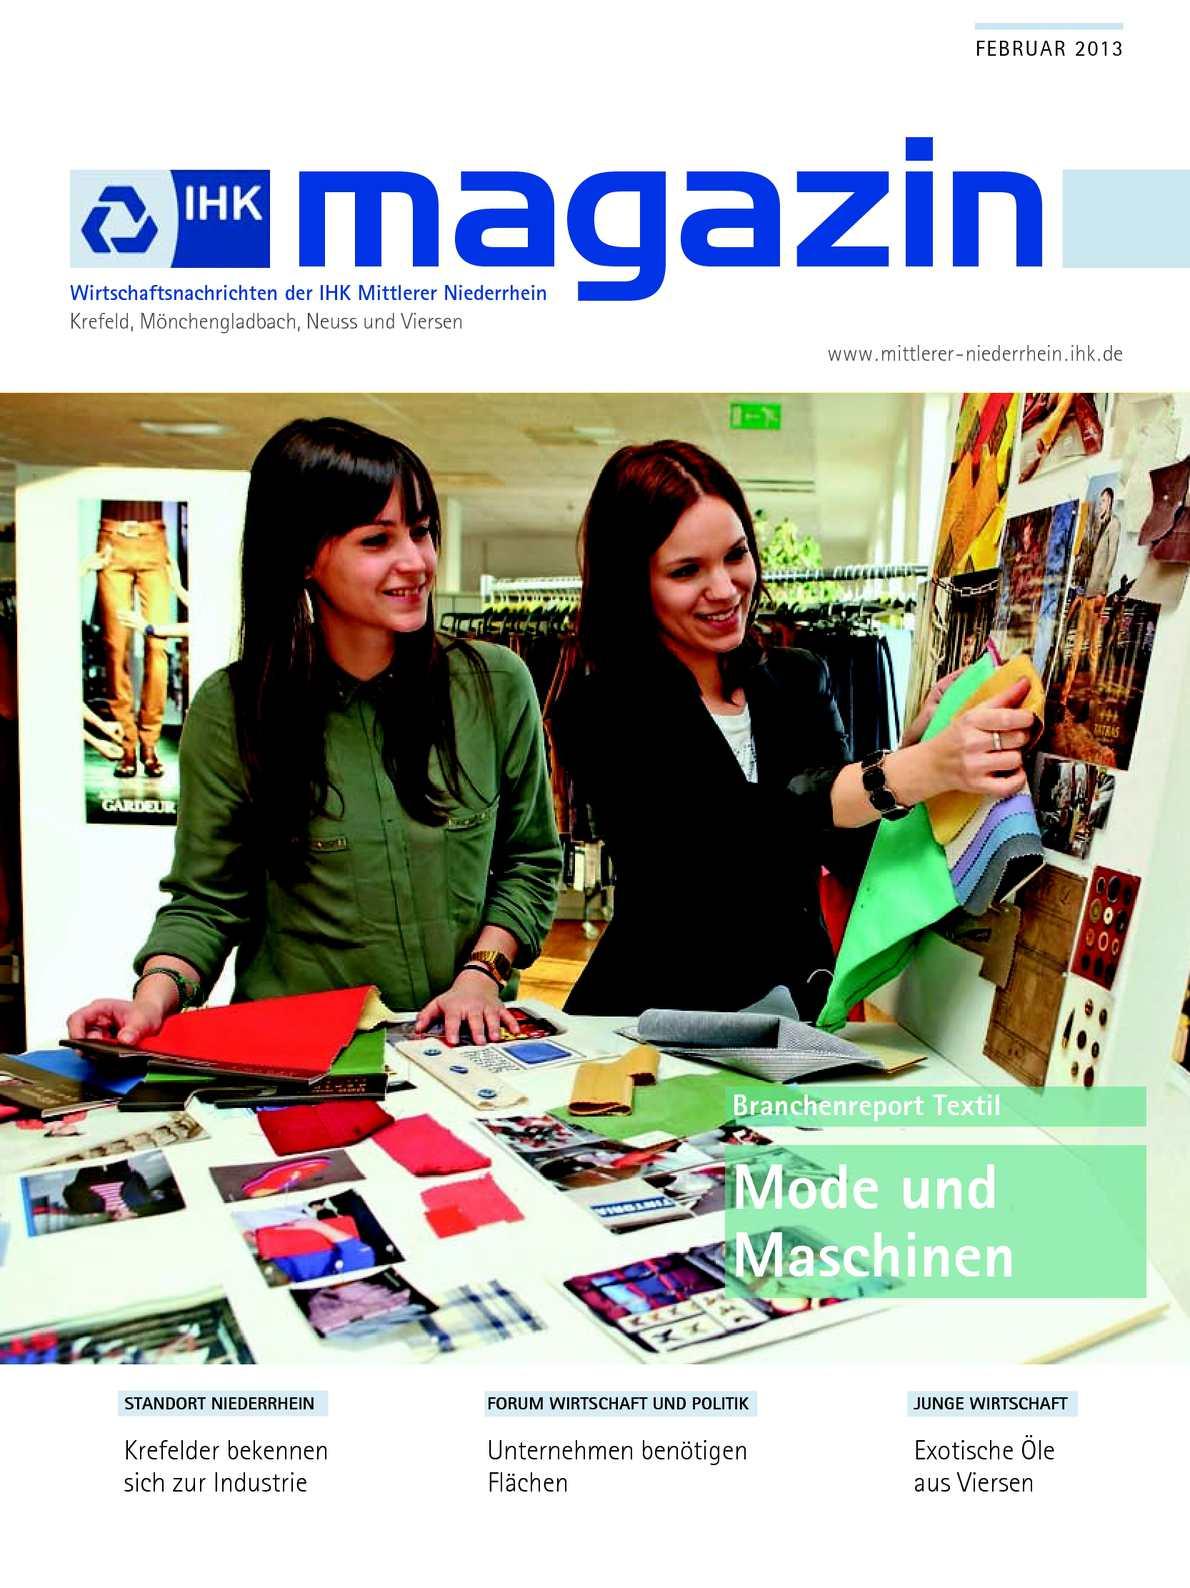 Calaméo - IHK Magazin Februar 2013